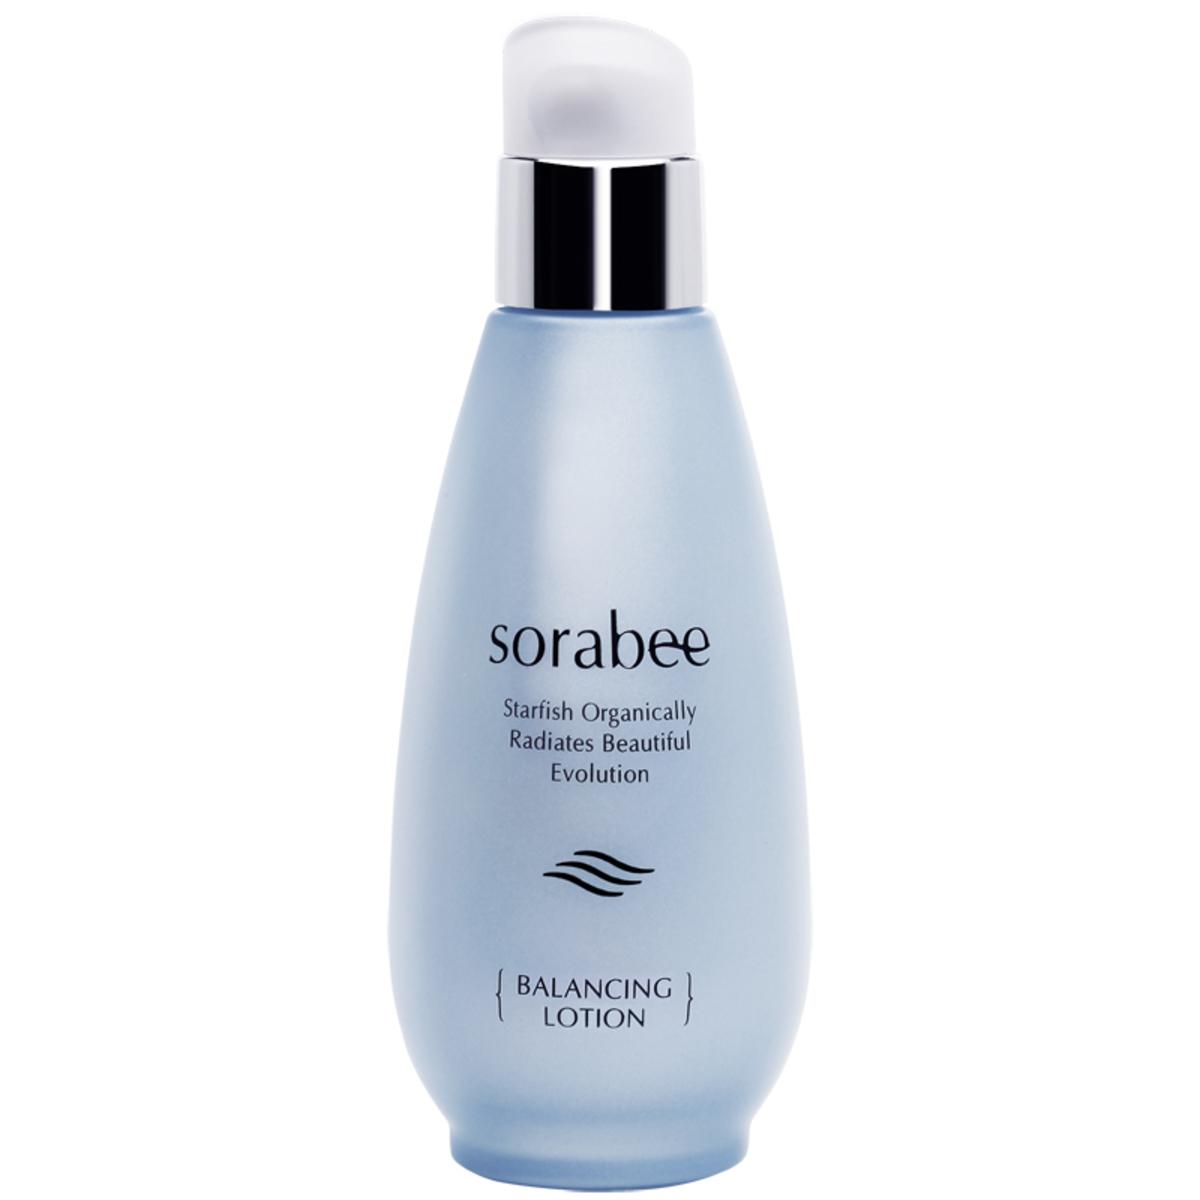 Sorabee Balancing Emulsion 均衡乳液 130ml 藍色